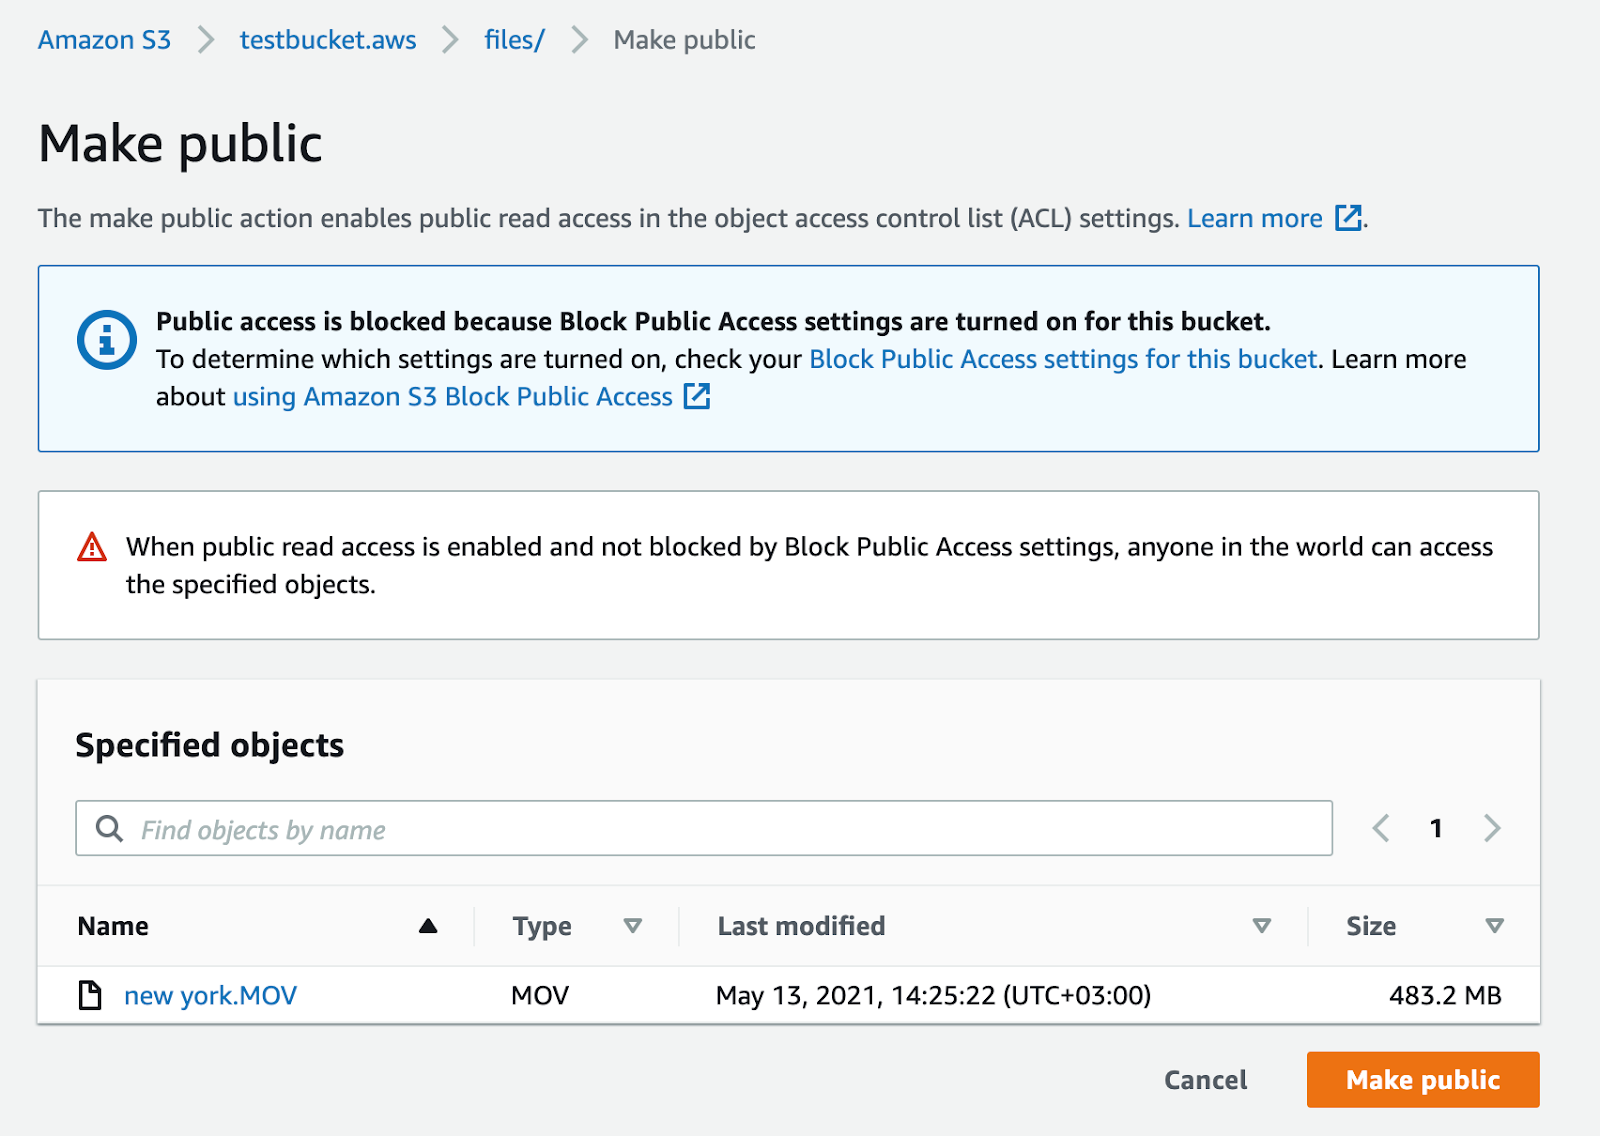 Make the video public to run it in Amazon S3